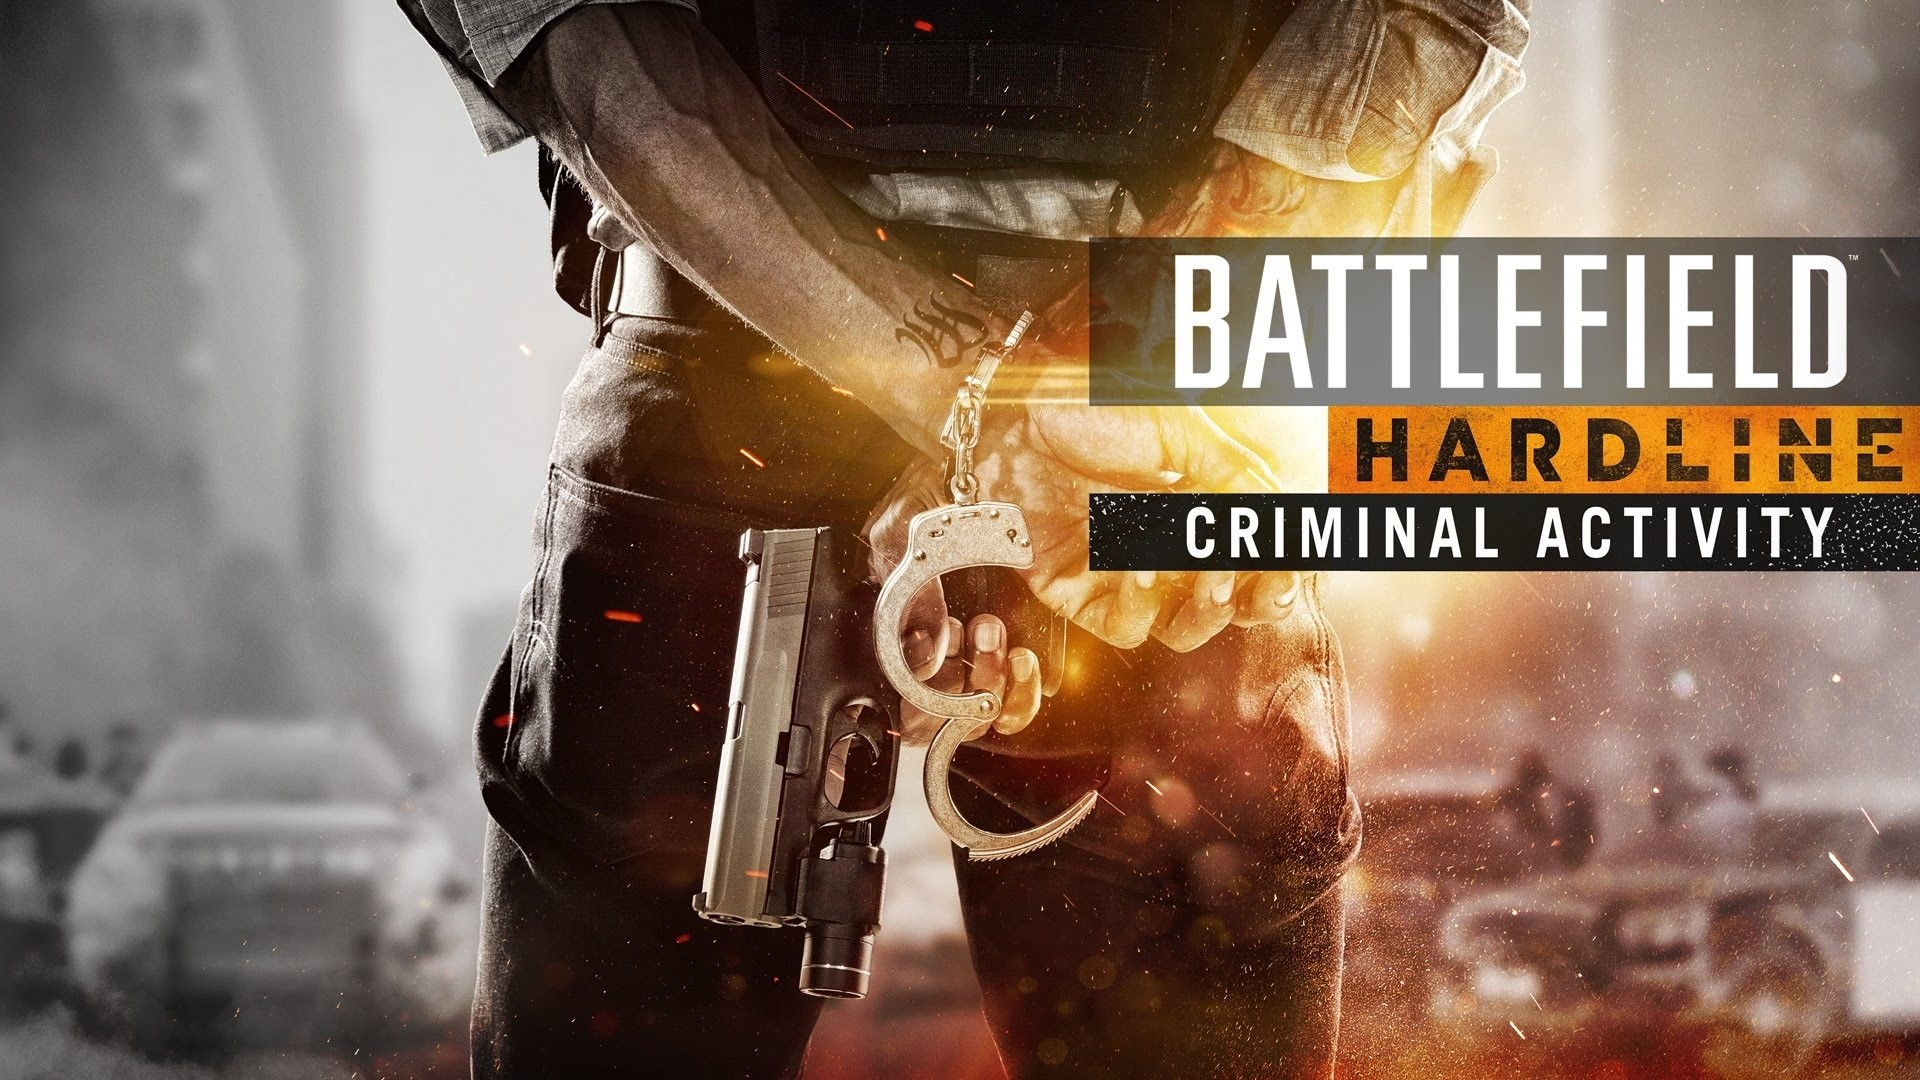 Fondos de pantalla Battlefield Hardline Criminal Activity